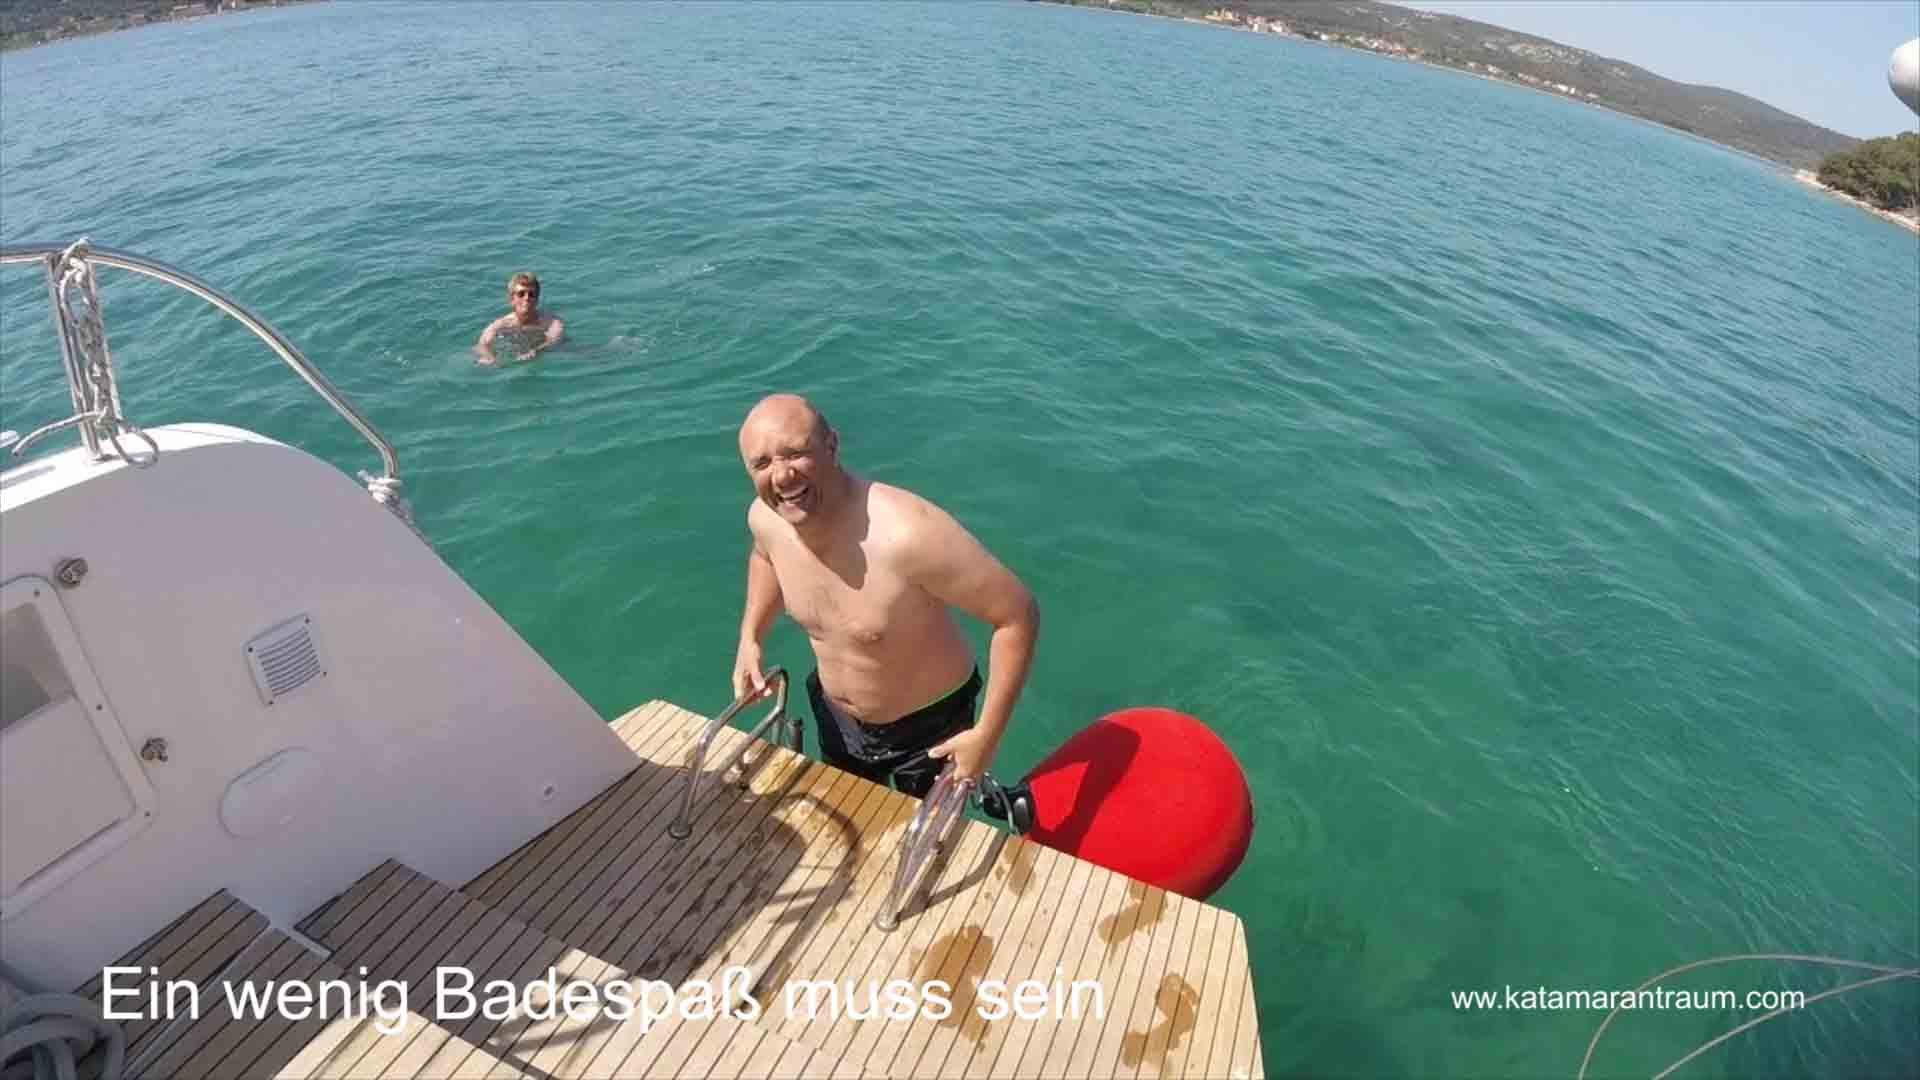 In catamaran training week, bathing fun is allowed